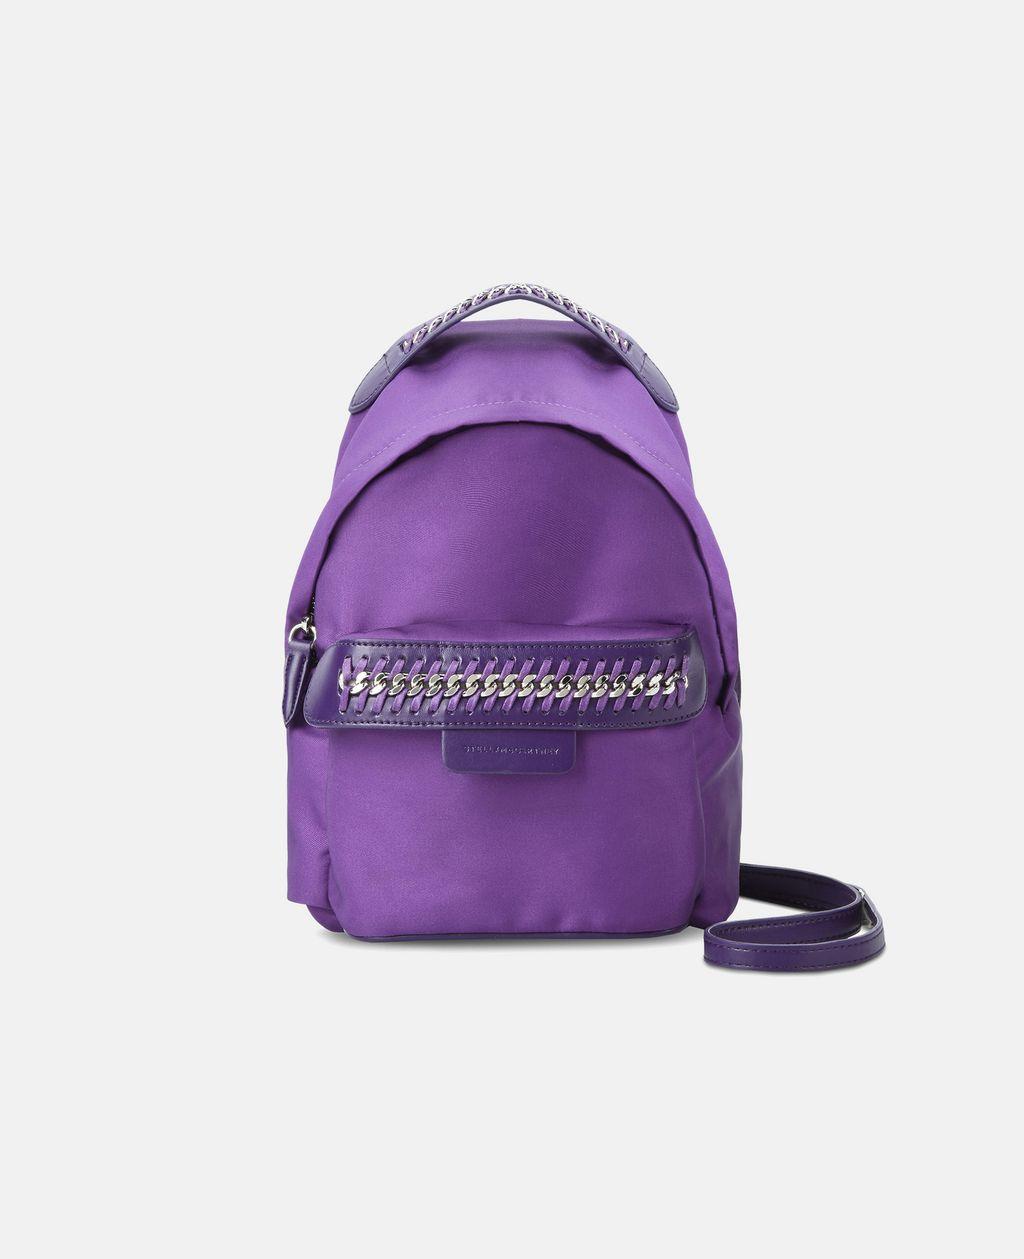 Purple Falabella GO Mini Backpack - STELLA MCCARTNEY